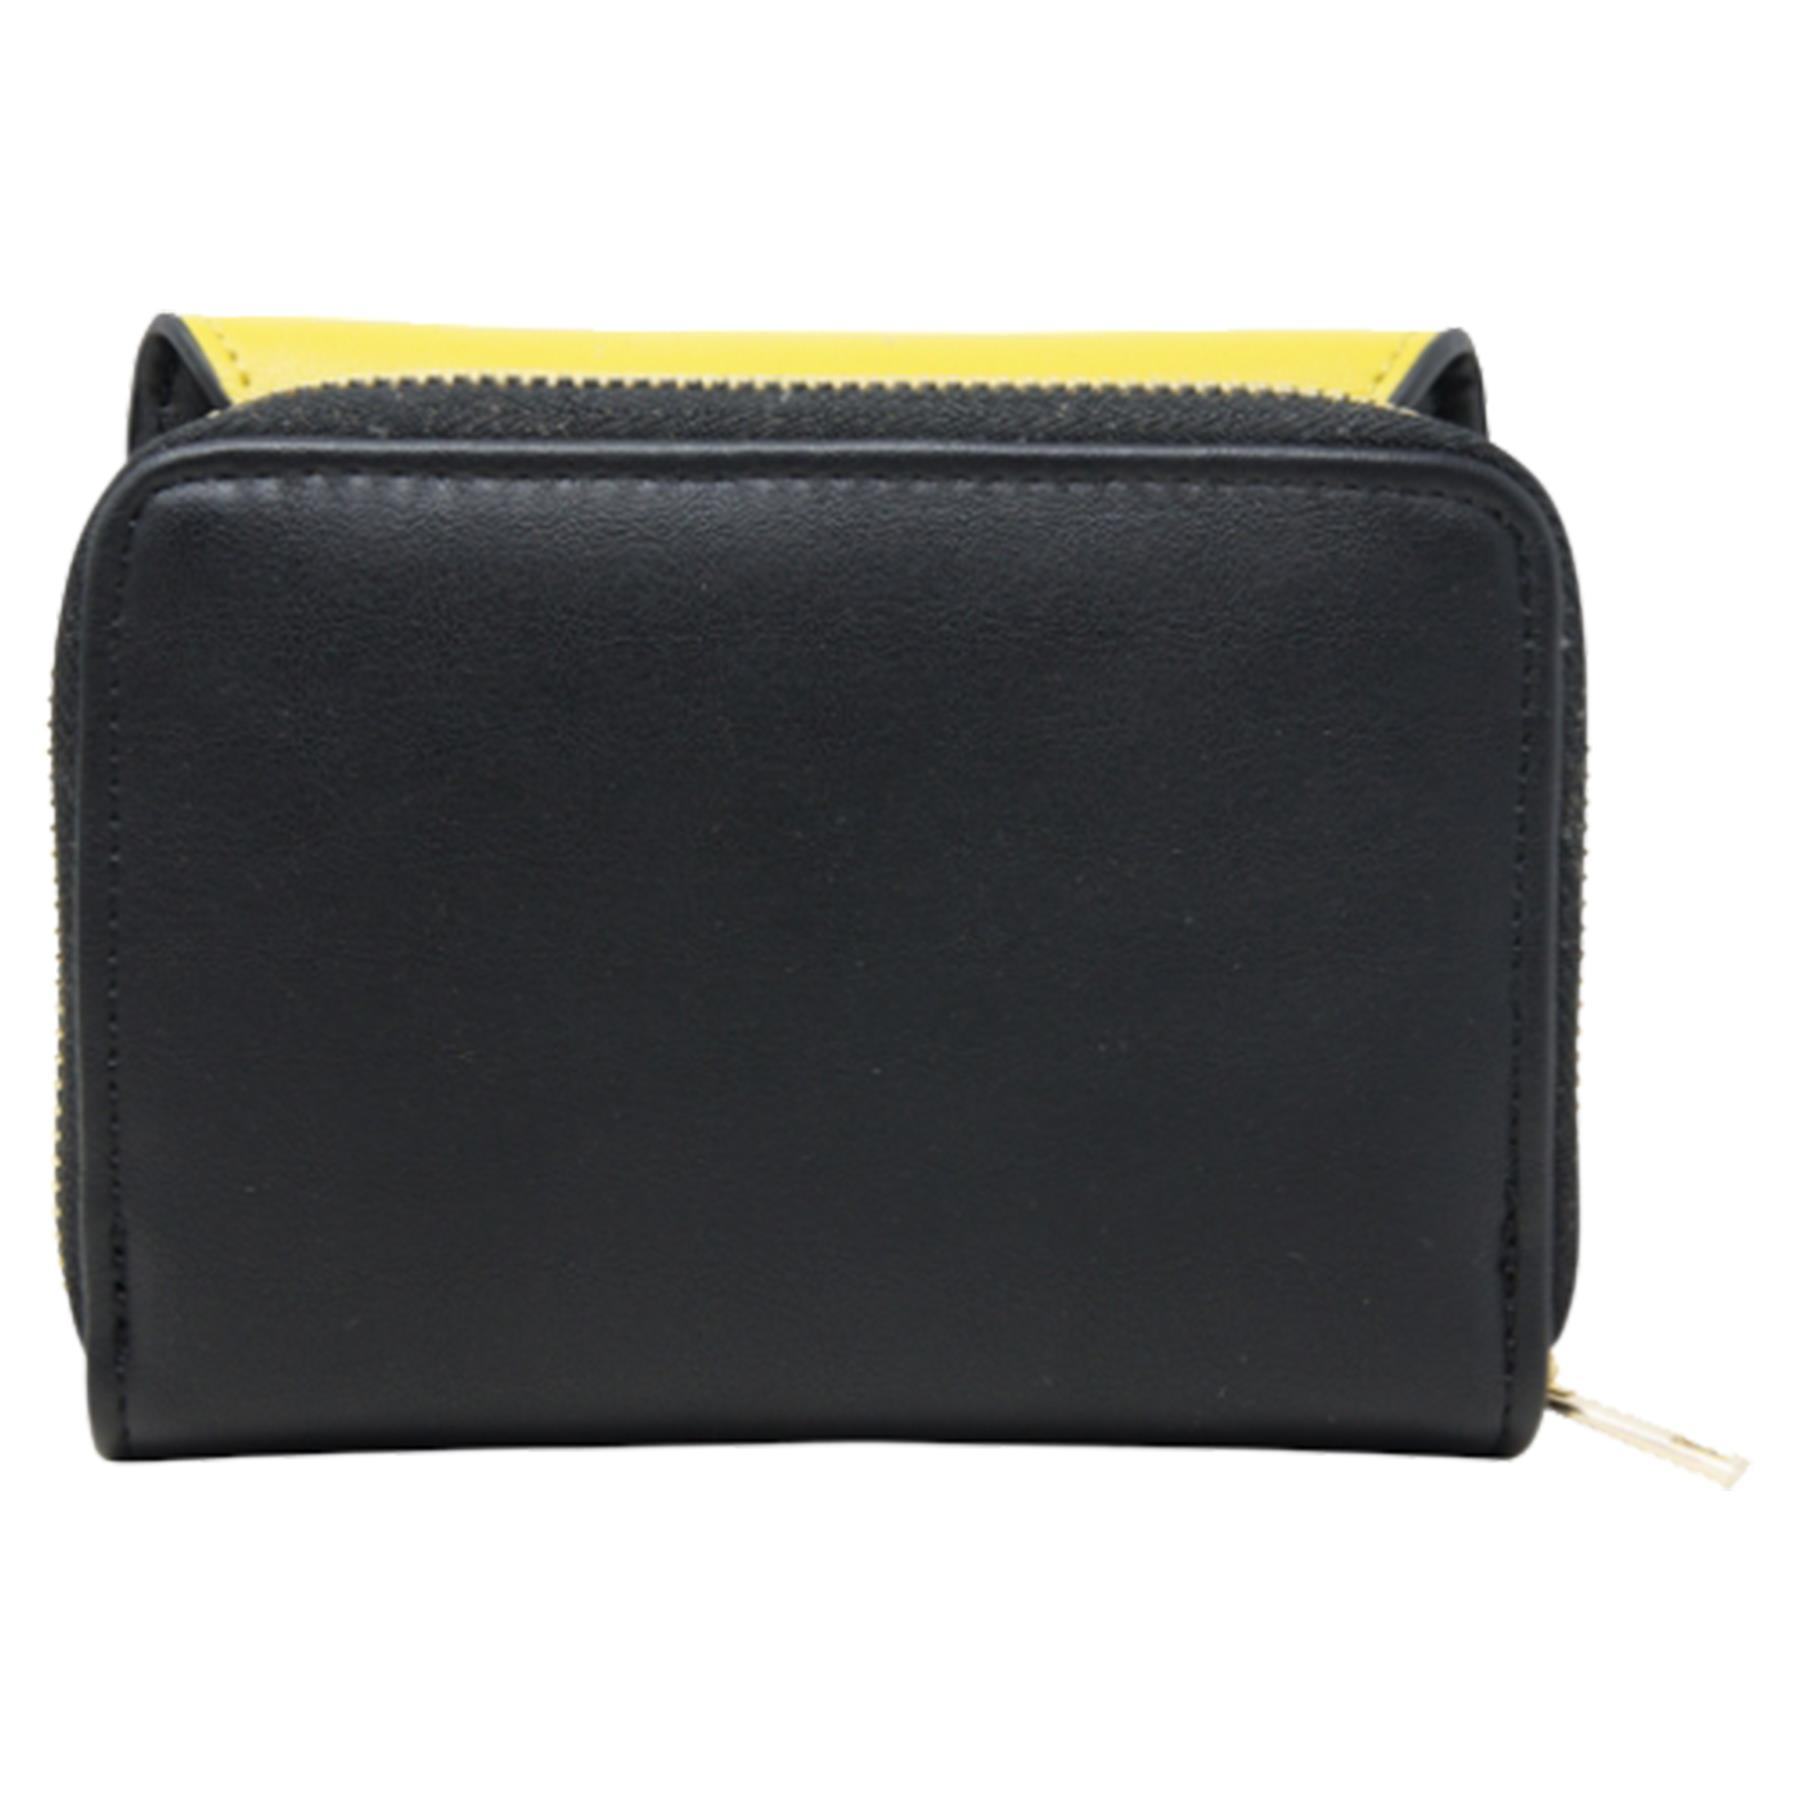 New-Ladies-Multicoloured-Envelope-Faux-Leather-Reptile-Detail-Purse thumbnail 8